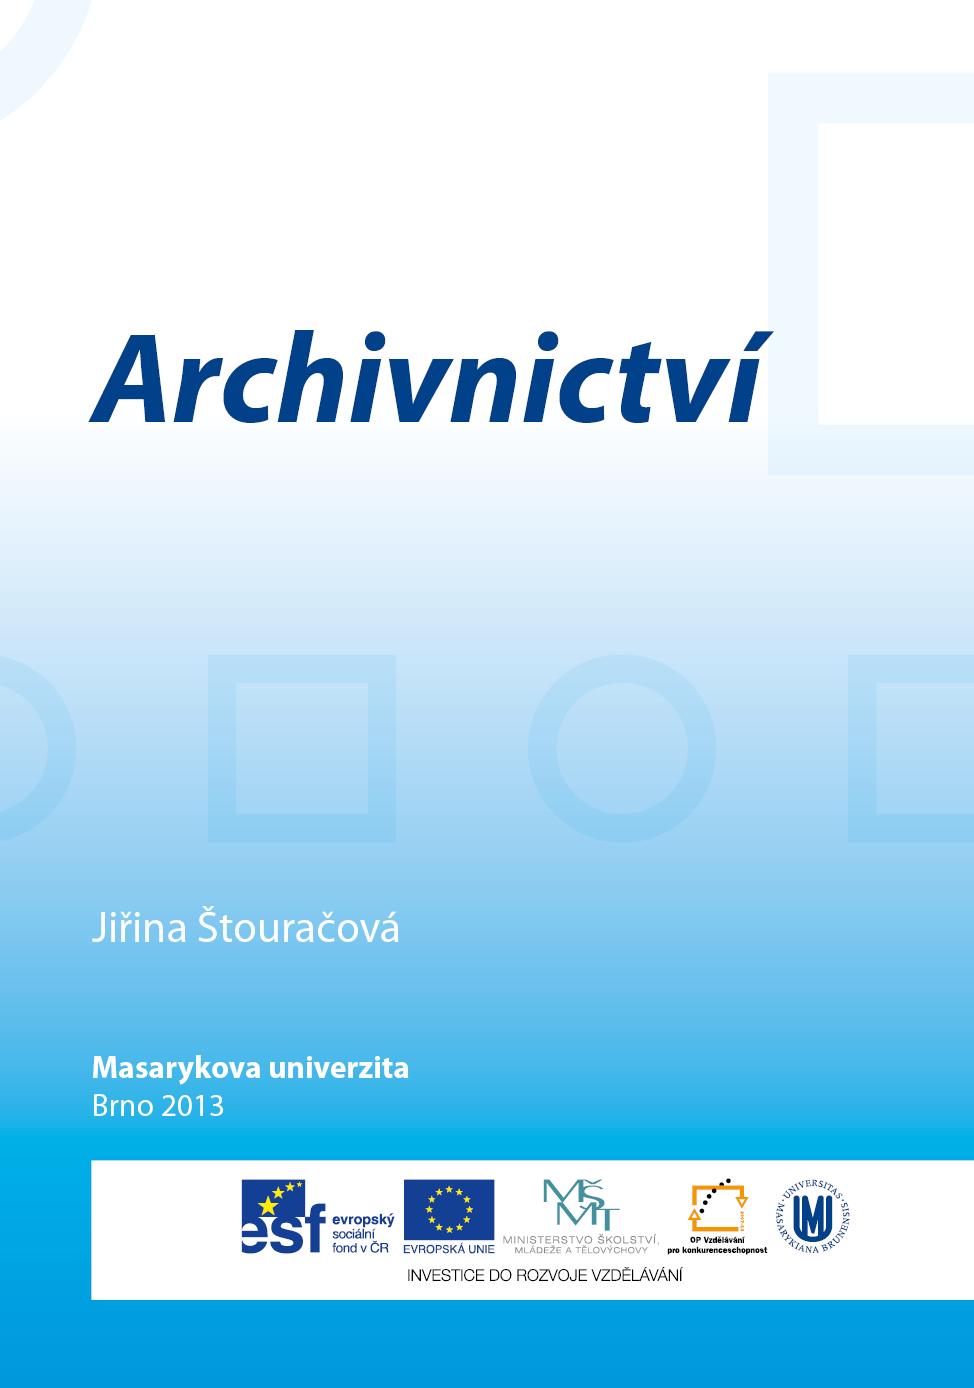 Archivnictvi